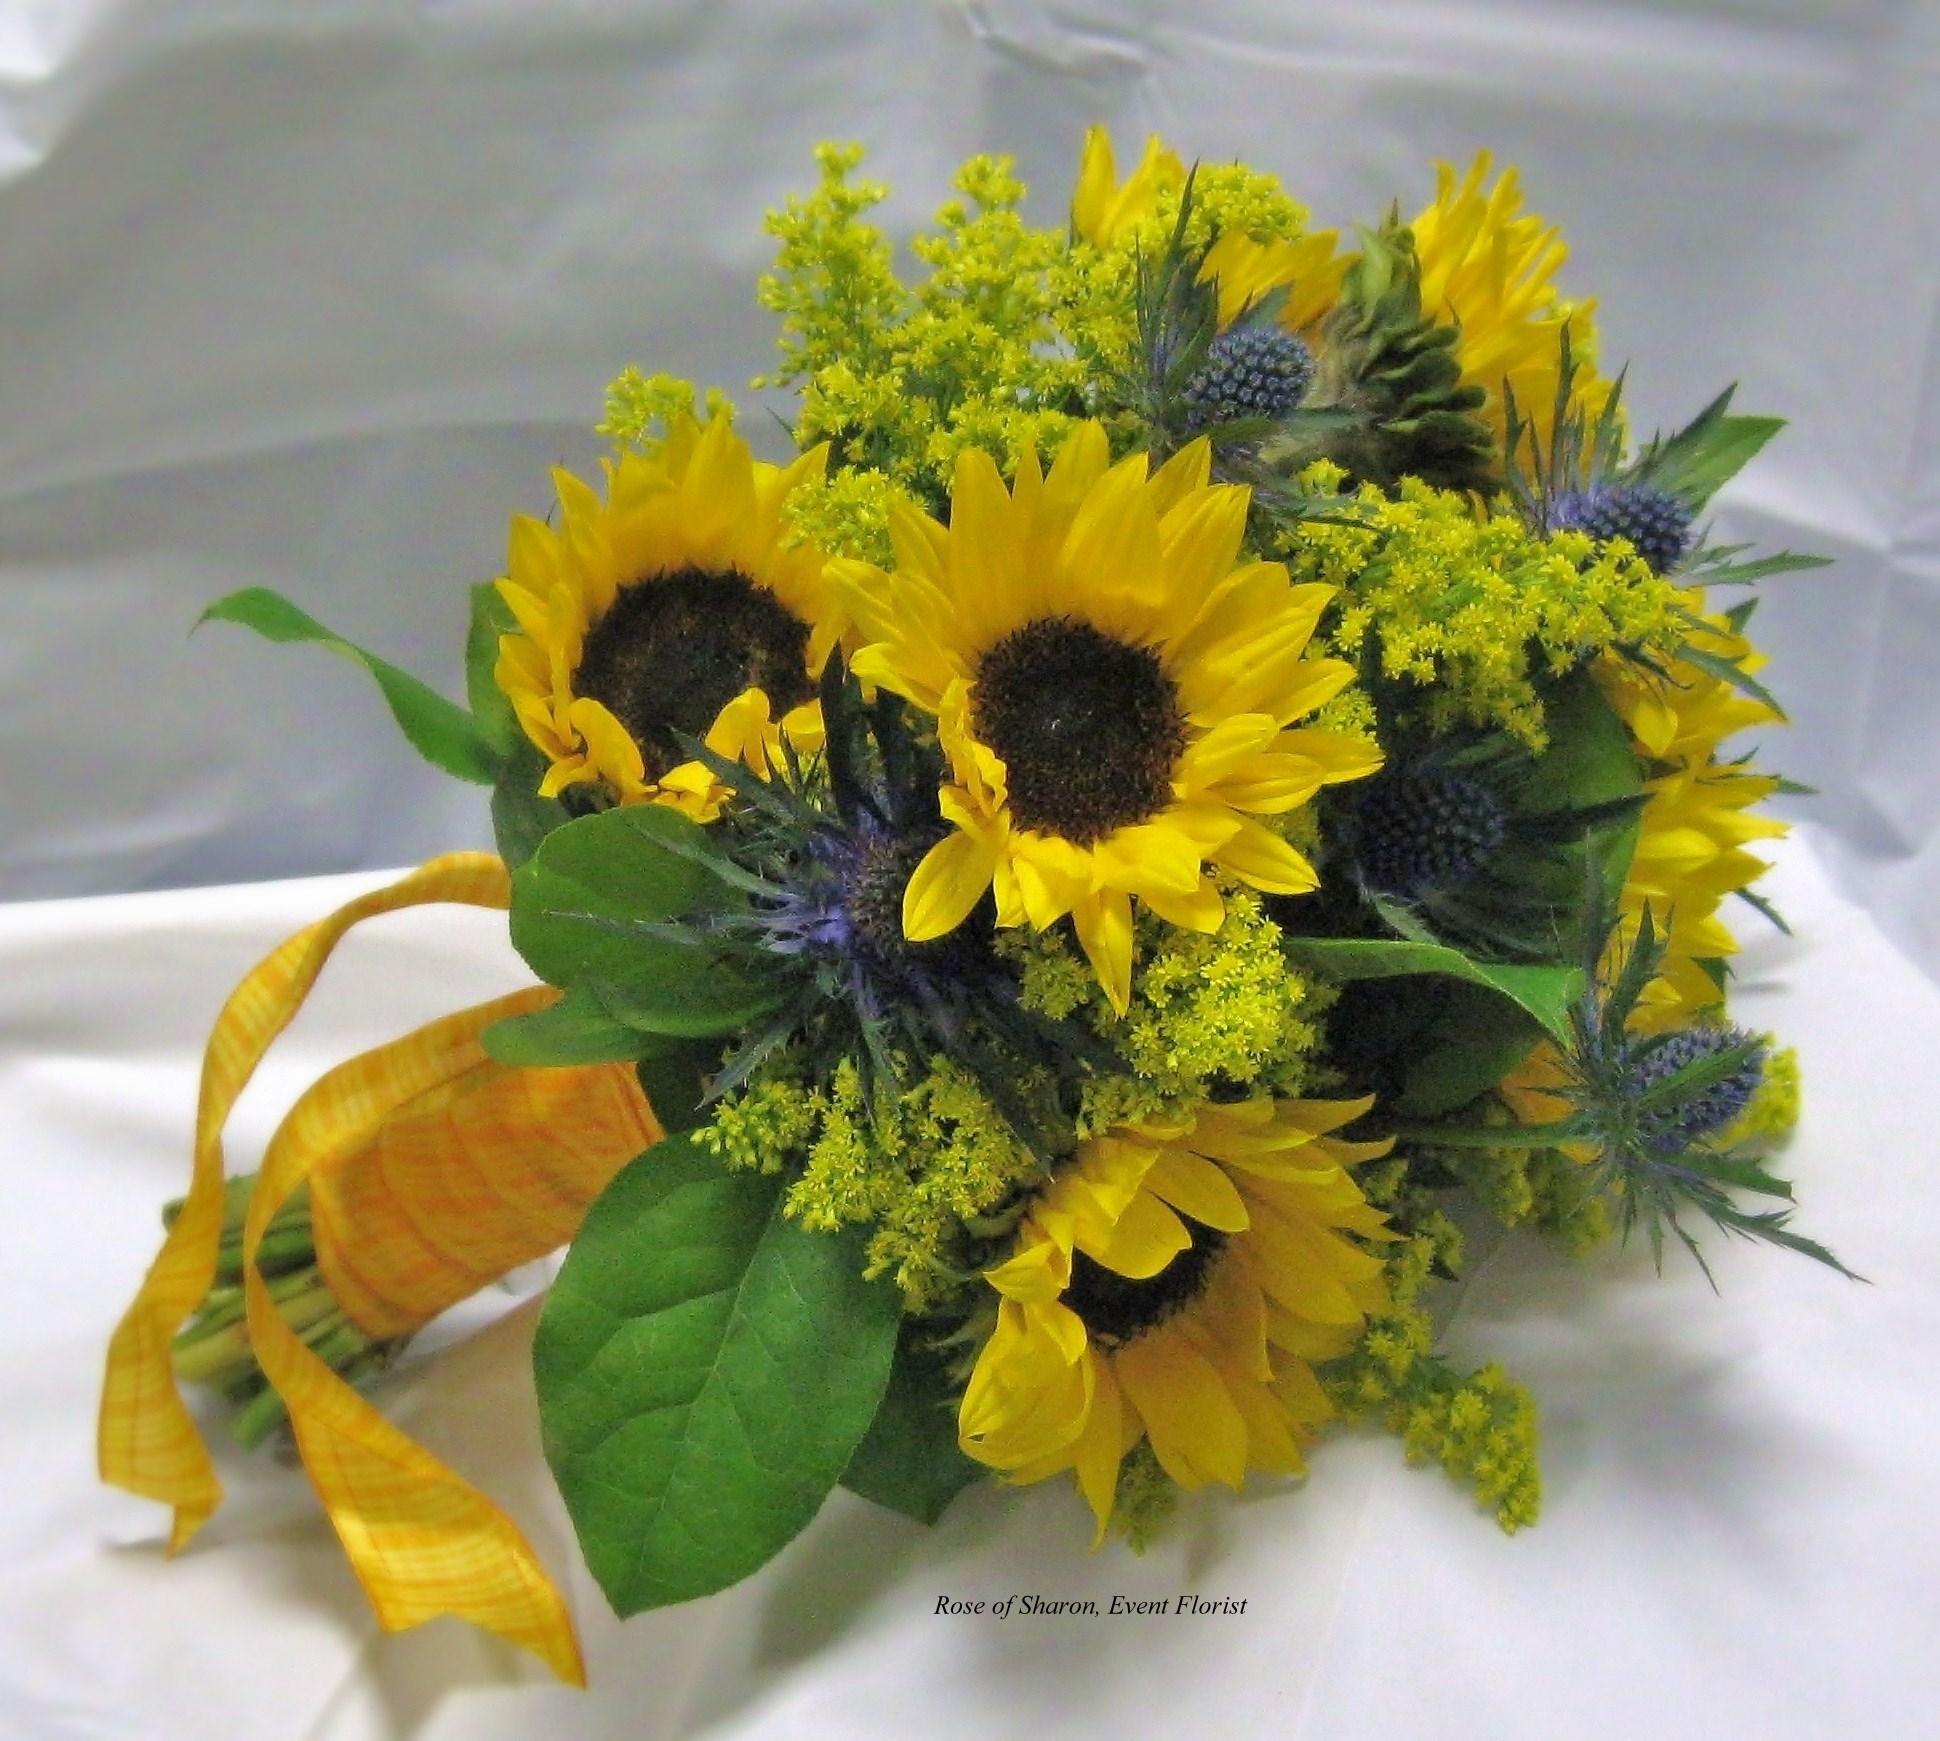 Sunflower, solidago & eryngium bouquet. Rose of Sharon Floral Designs